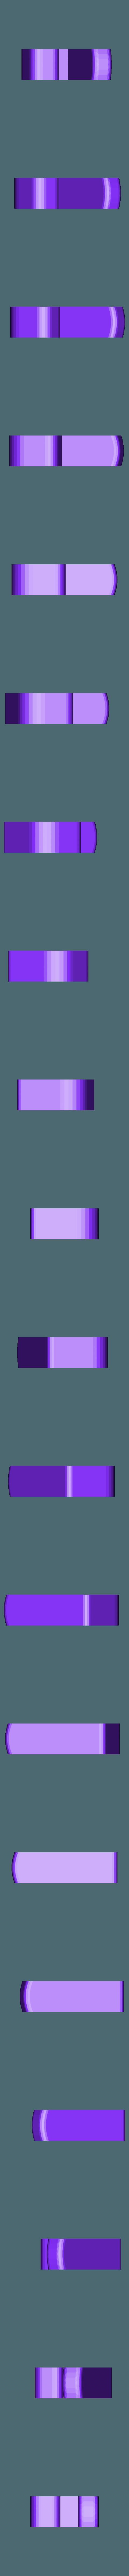 PIN.stl Download STL file Armillary phone holder • 3D printer model, 3d-fabric-jean-pierre